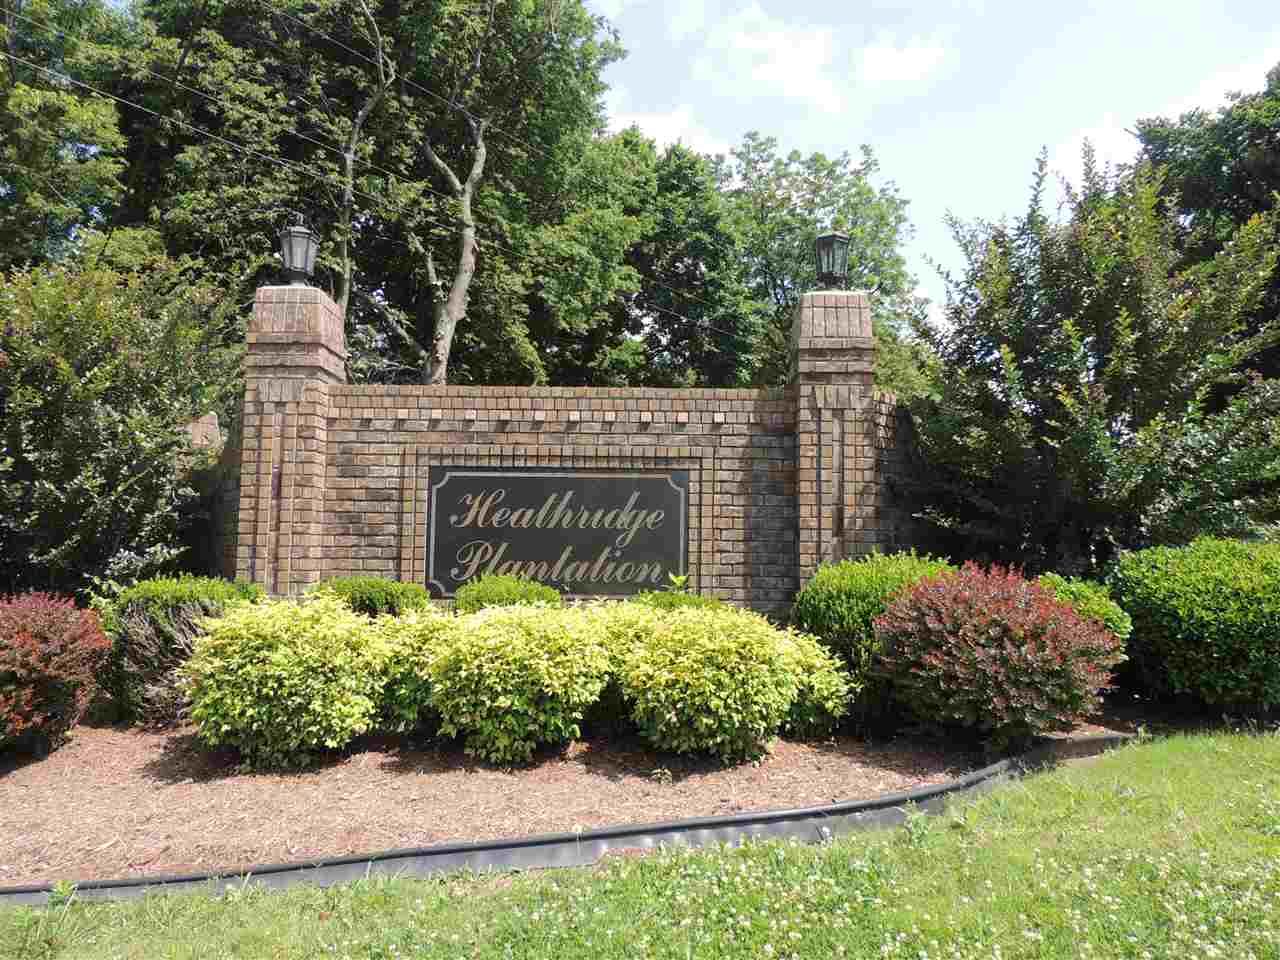 Heathridge Drive,Dyersburg,Tennessee 38204,Lots/land,Heathridge Drive,172550